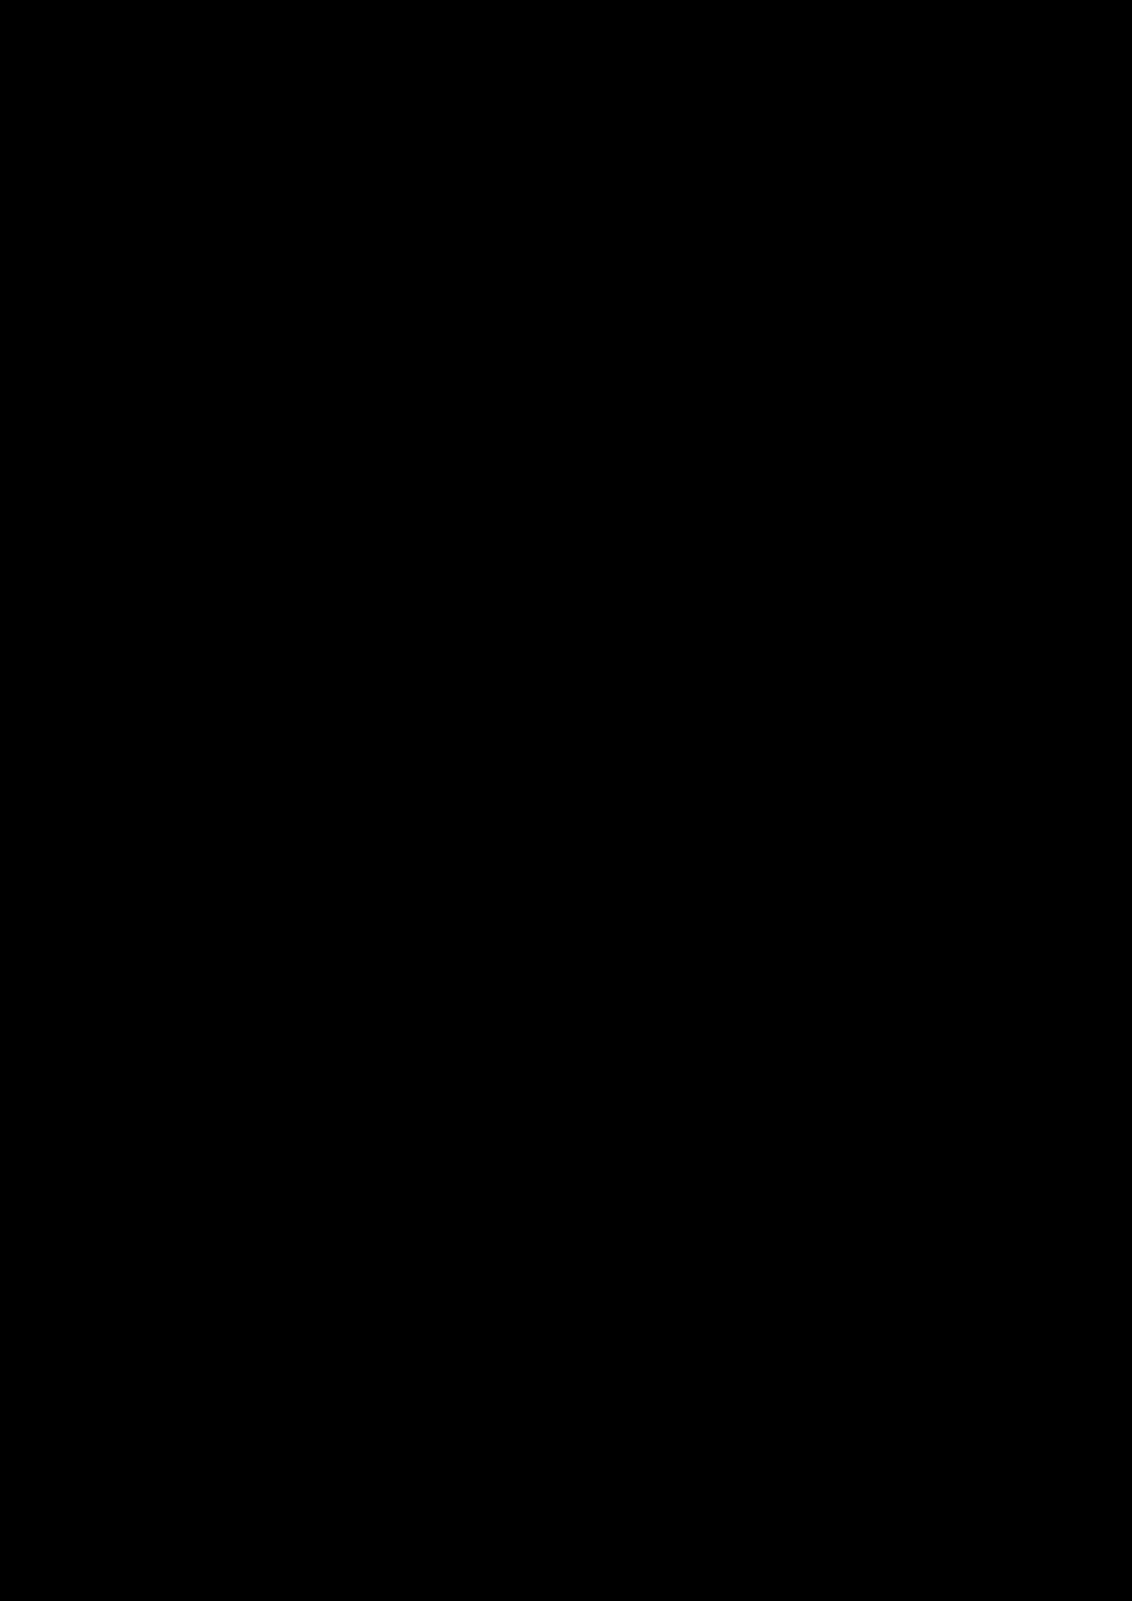 Okean Pustotyi slide, Image 13